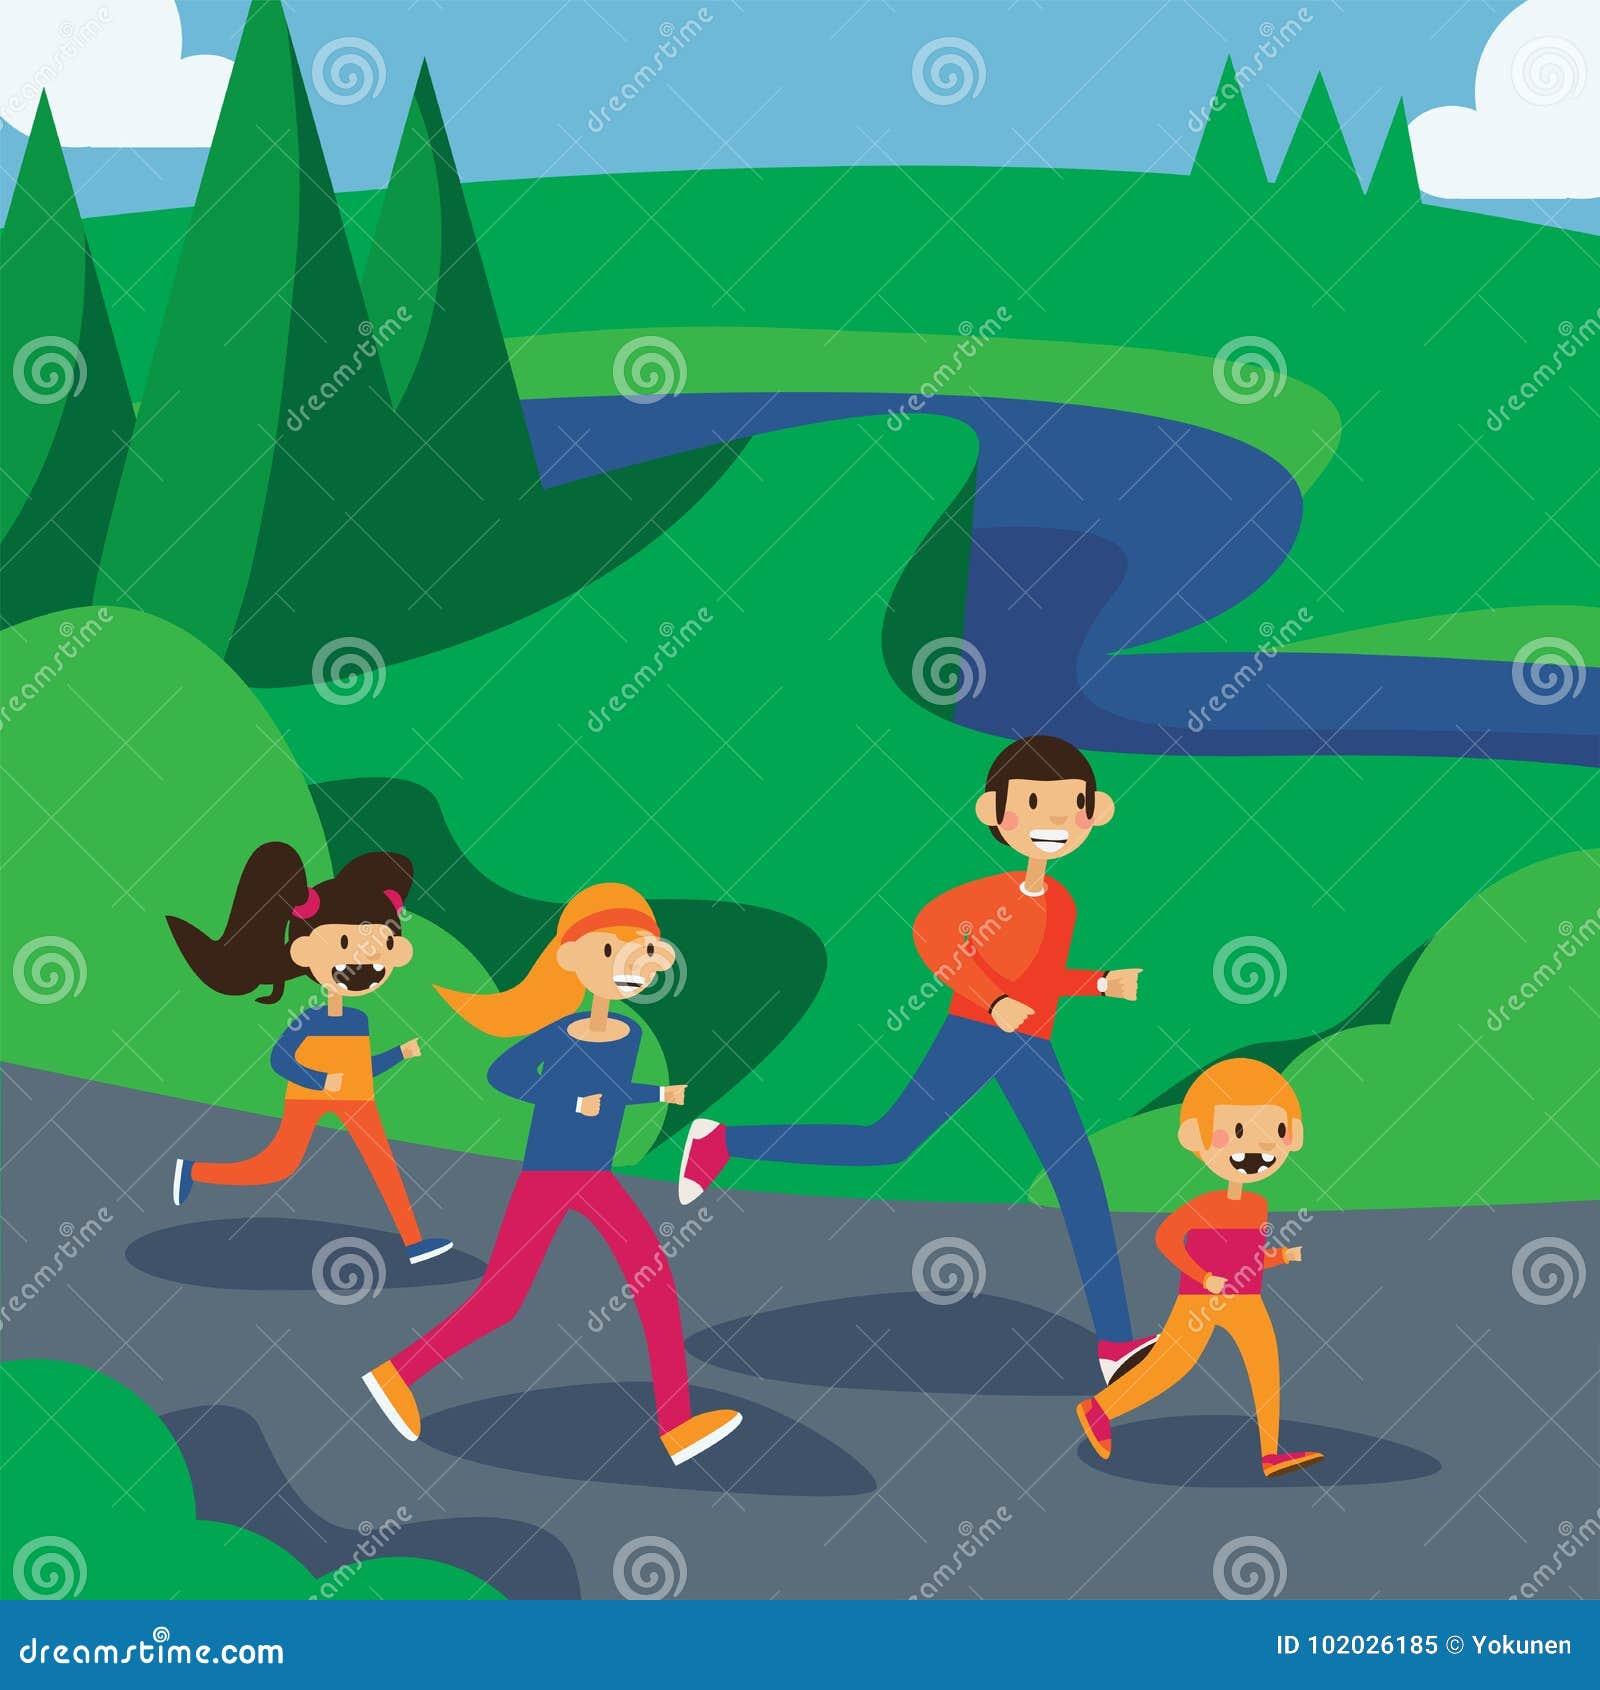 Happy Family Running In Park. Square Cartoon Illustration In Bright ...